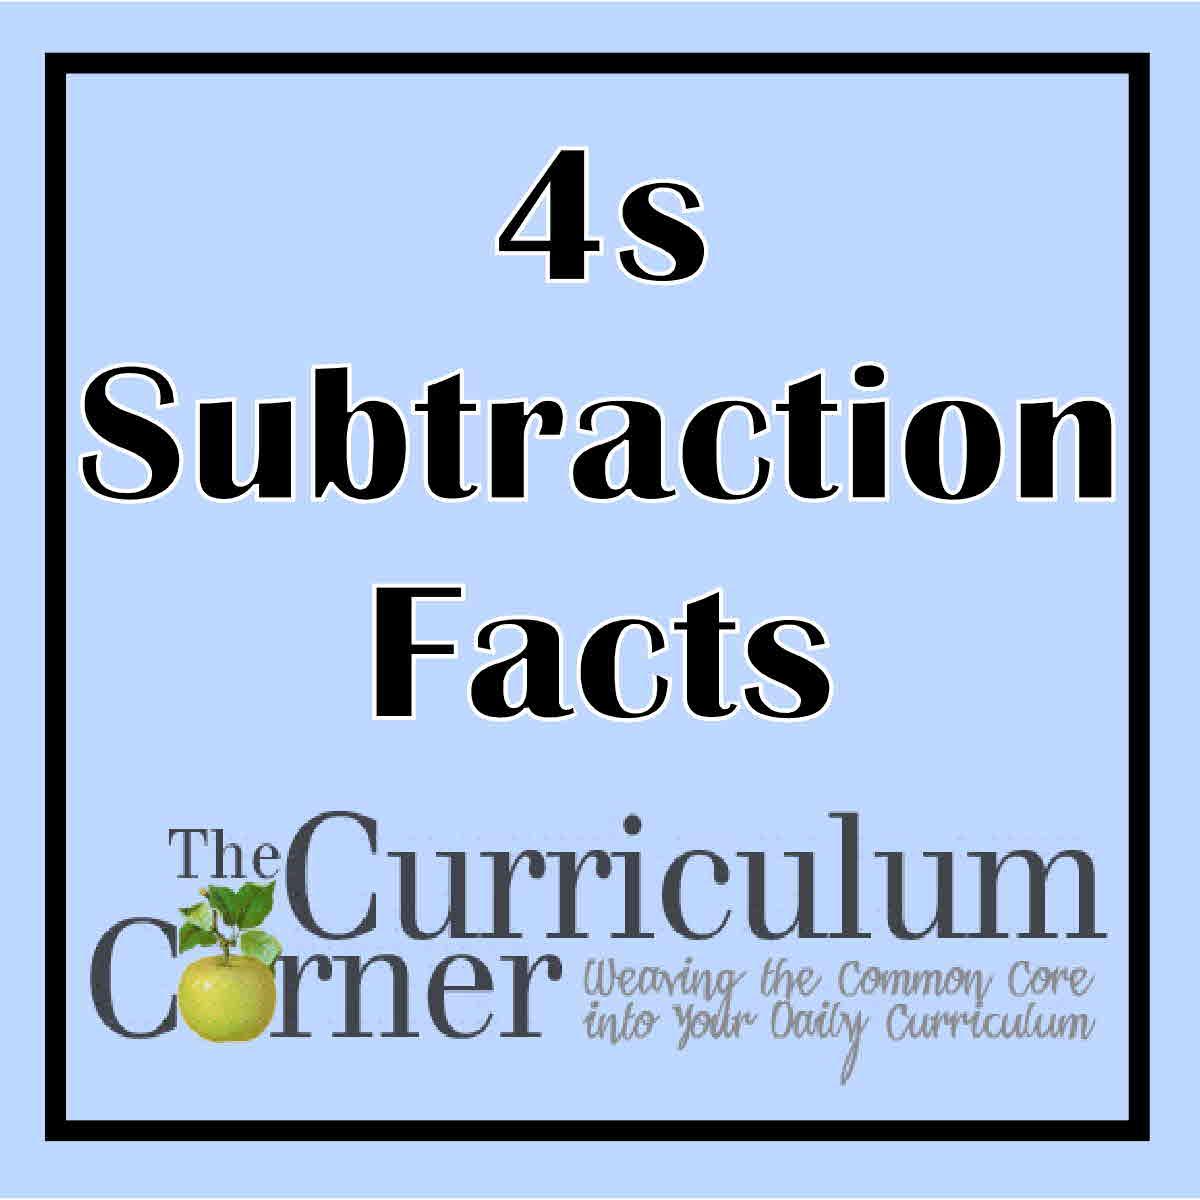 100 Subtraction Facts Timed Test Worksheet